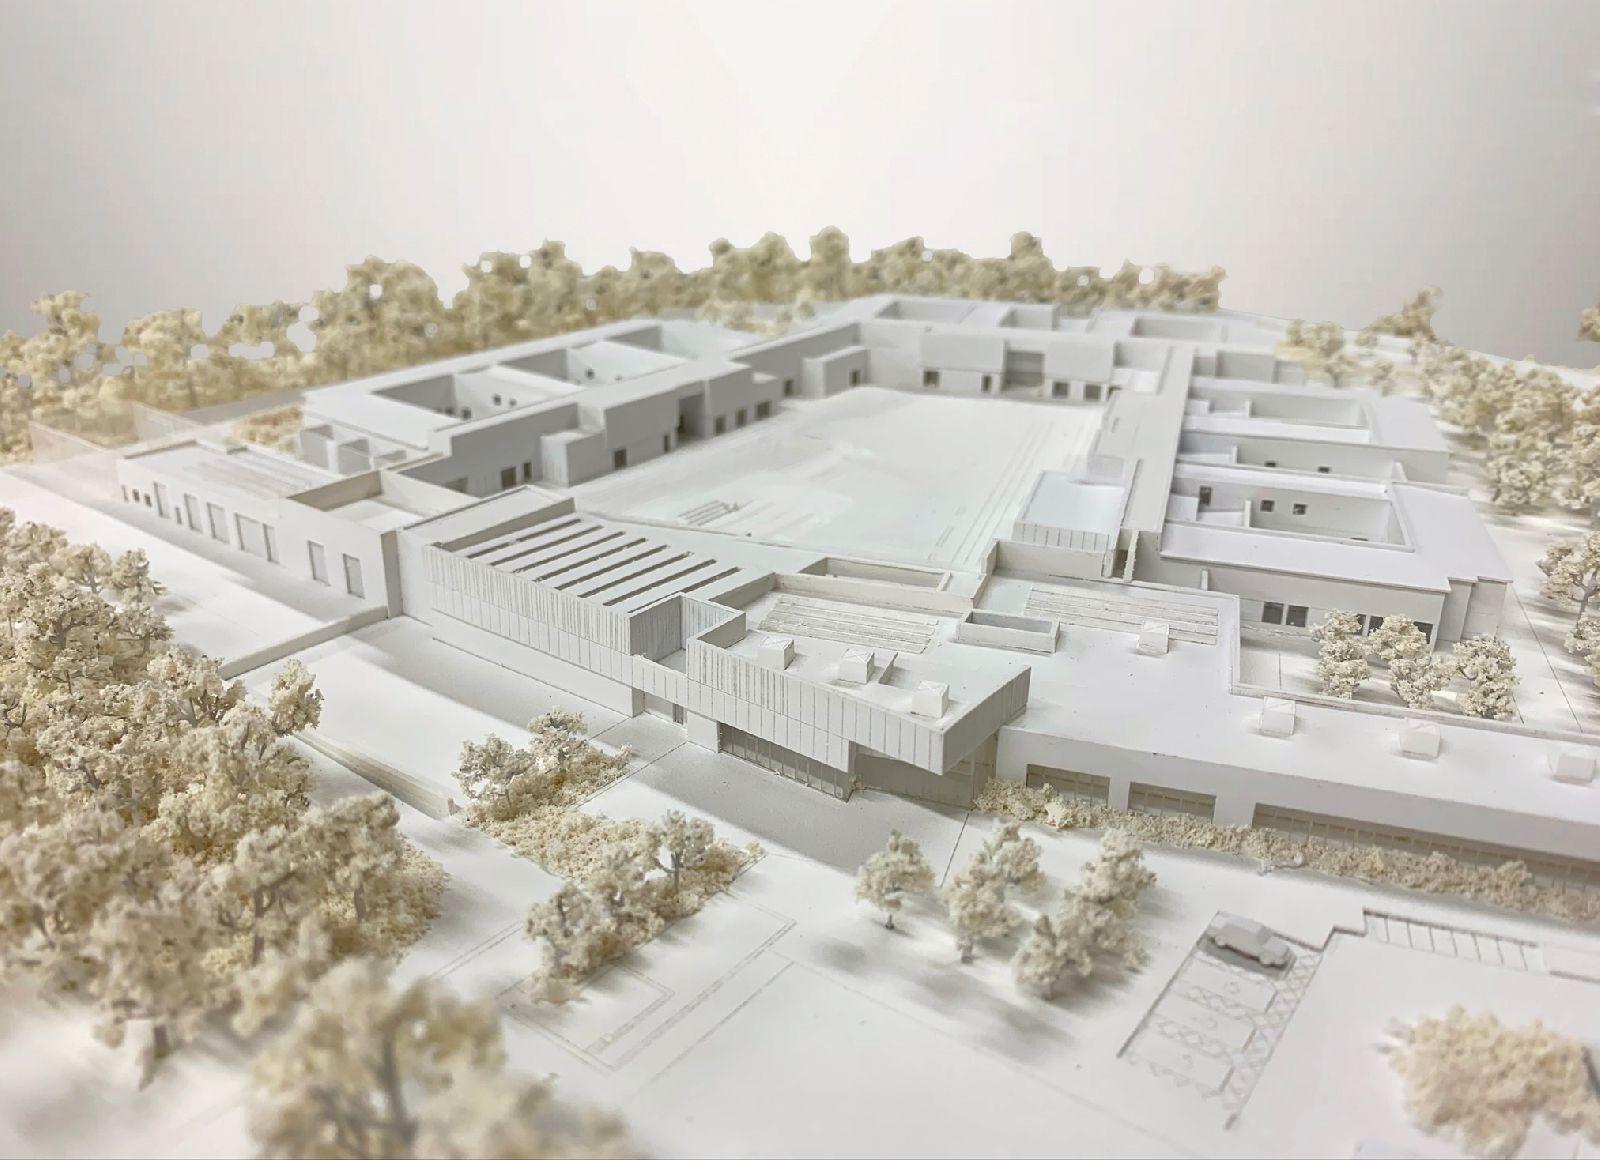 Northgate Hospital